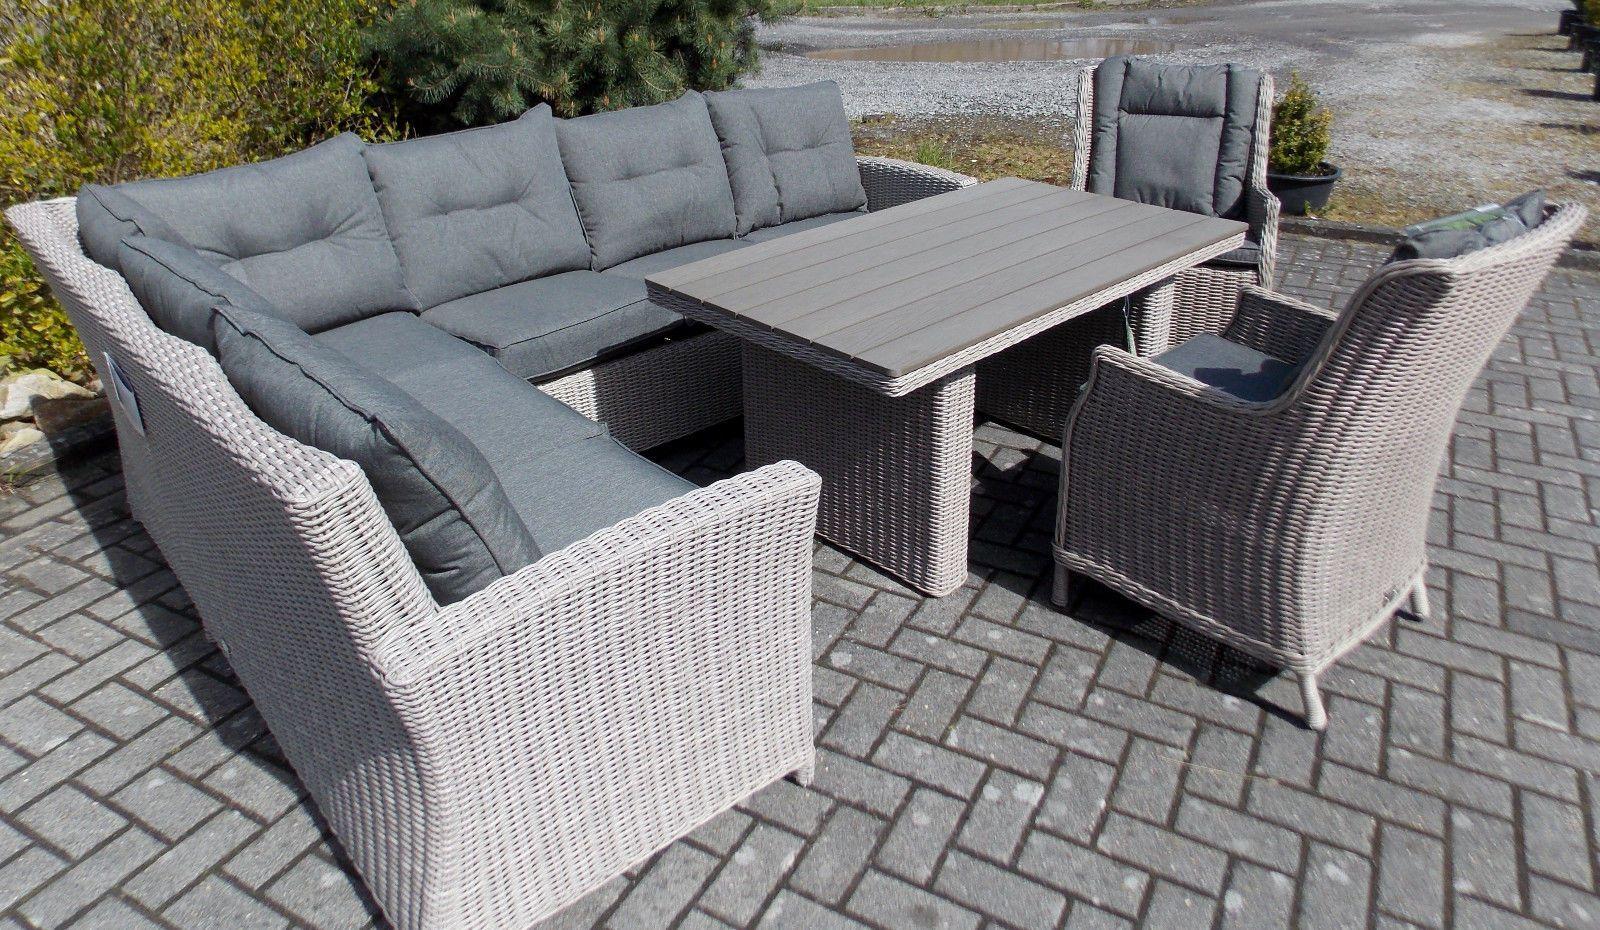 Polyrattan Sofaset Gartenmobel Lounge Sitzgruppe Sofa Eckgruppe